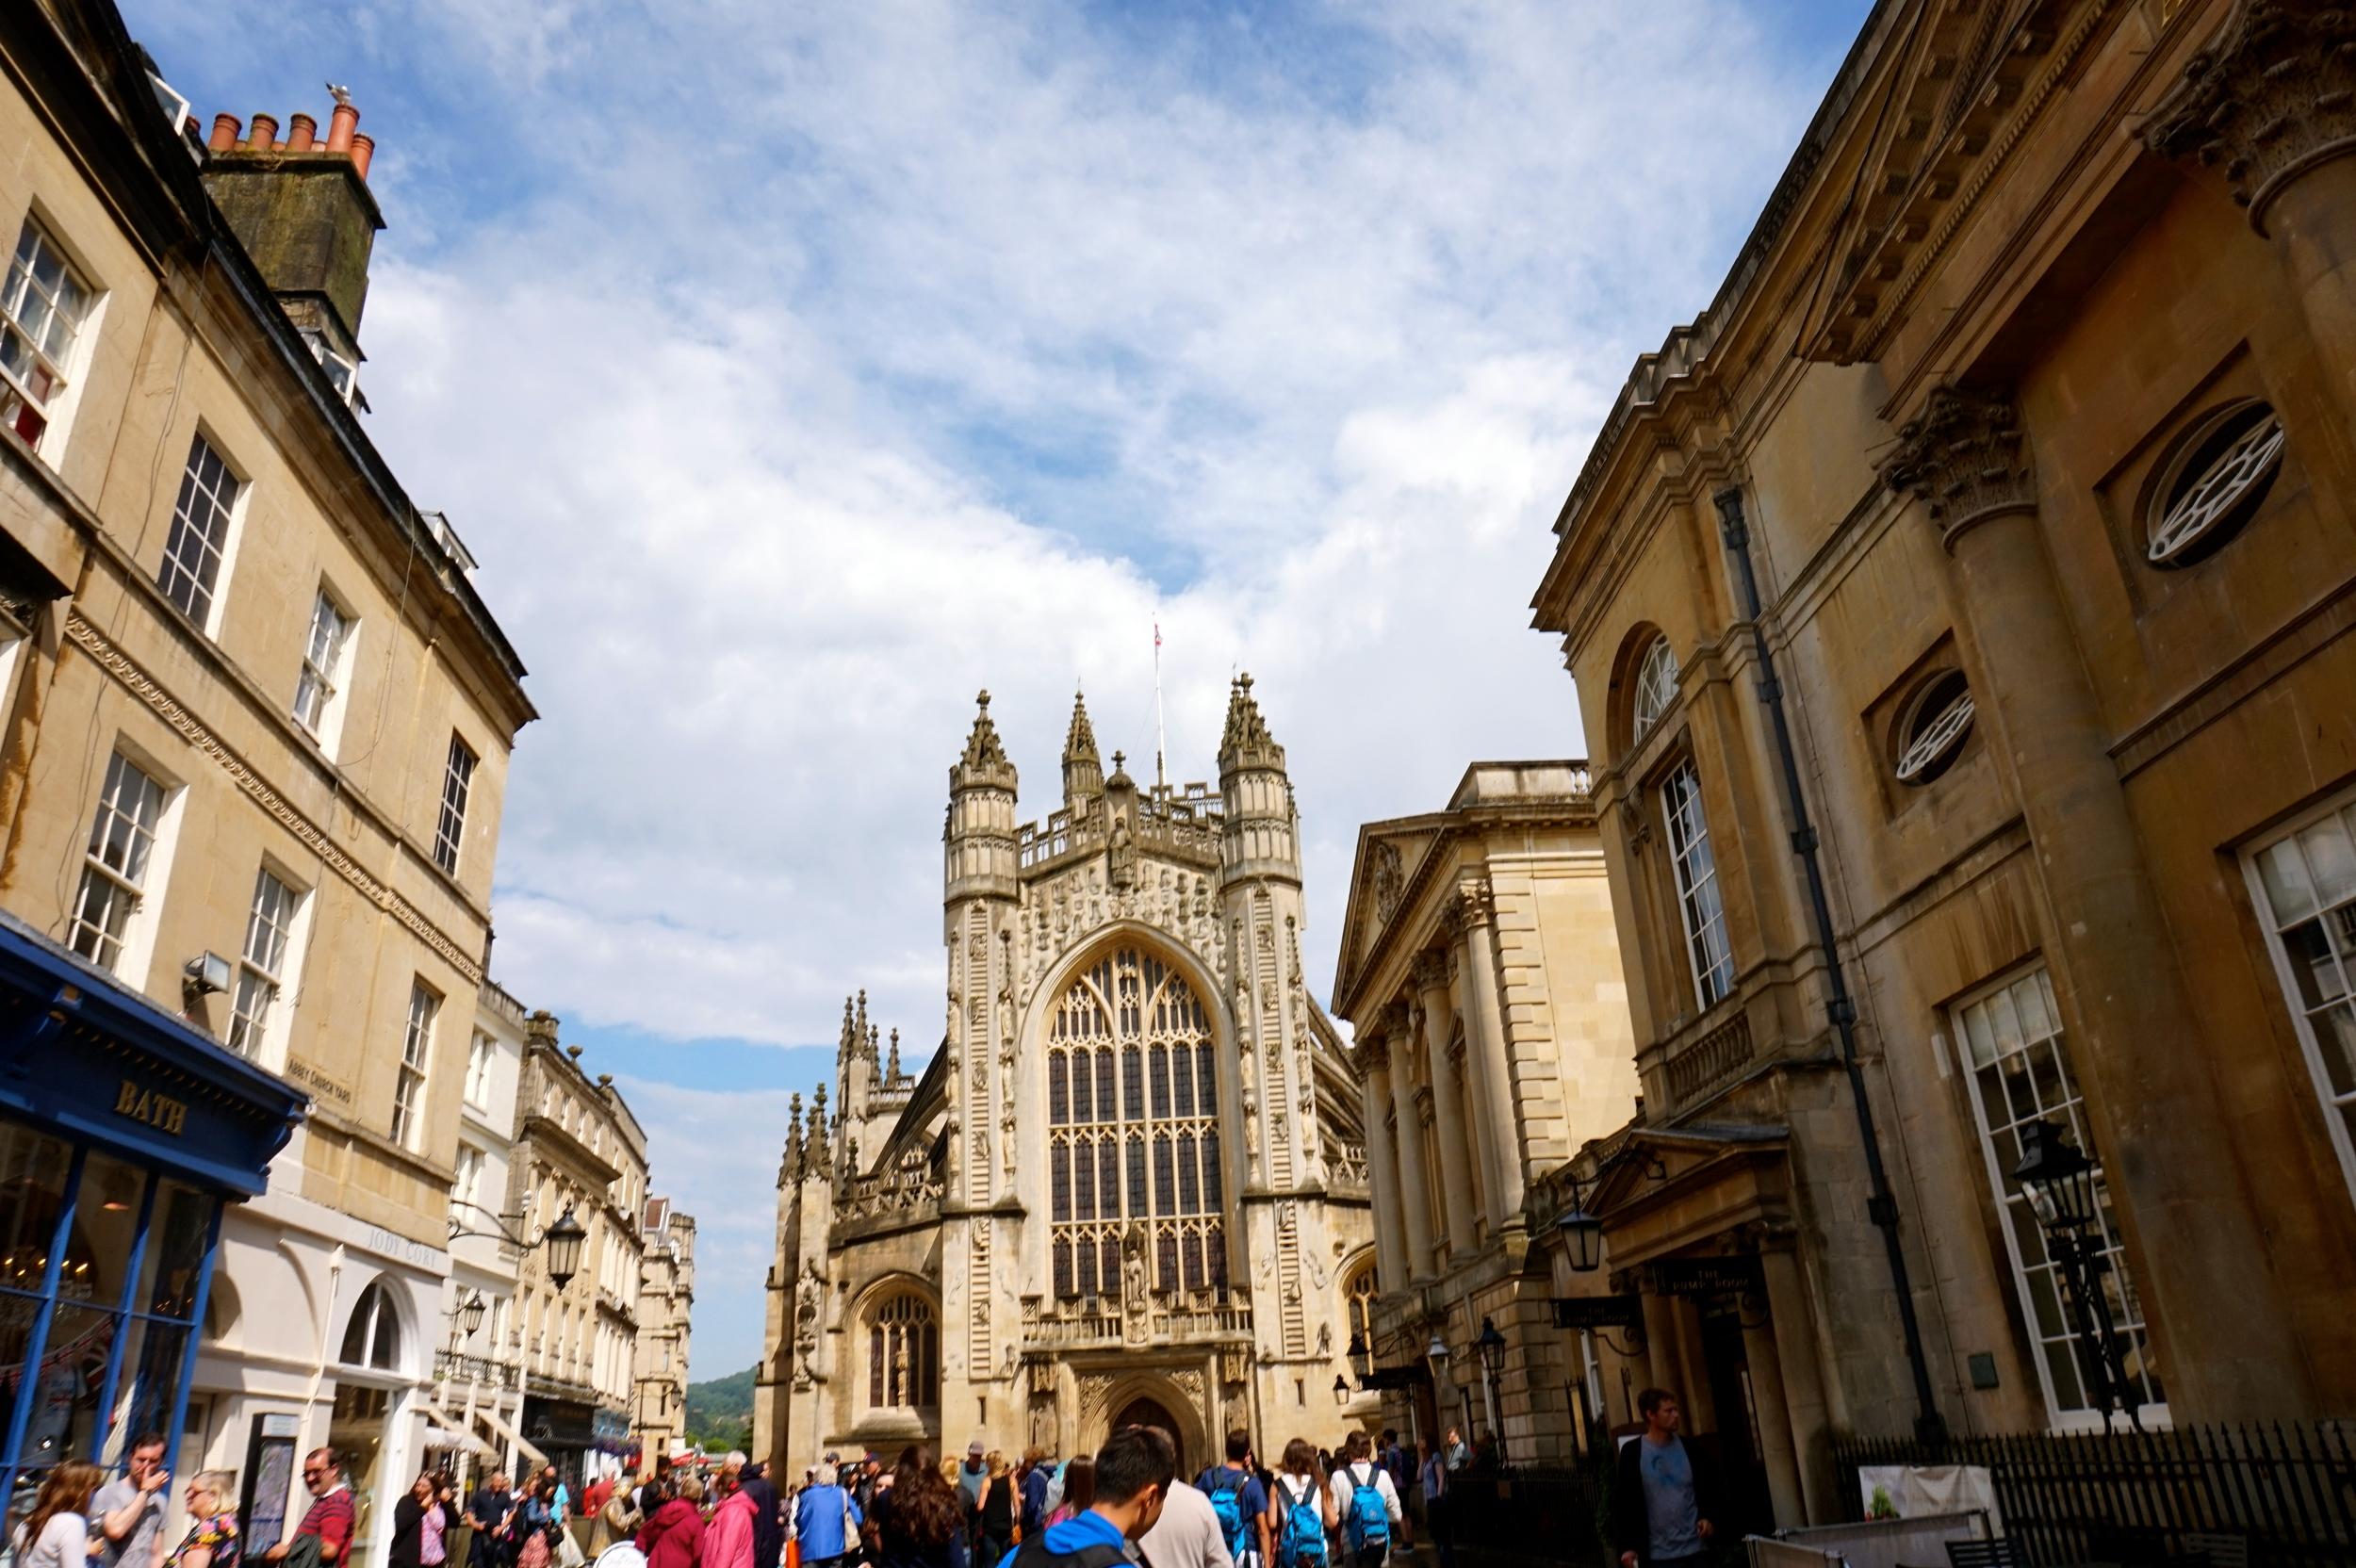 The Abbey of Bath